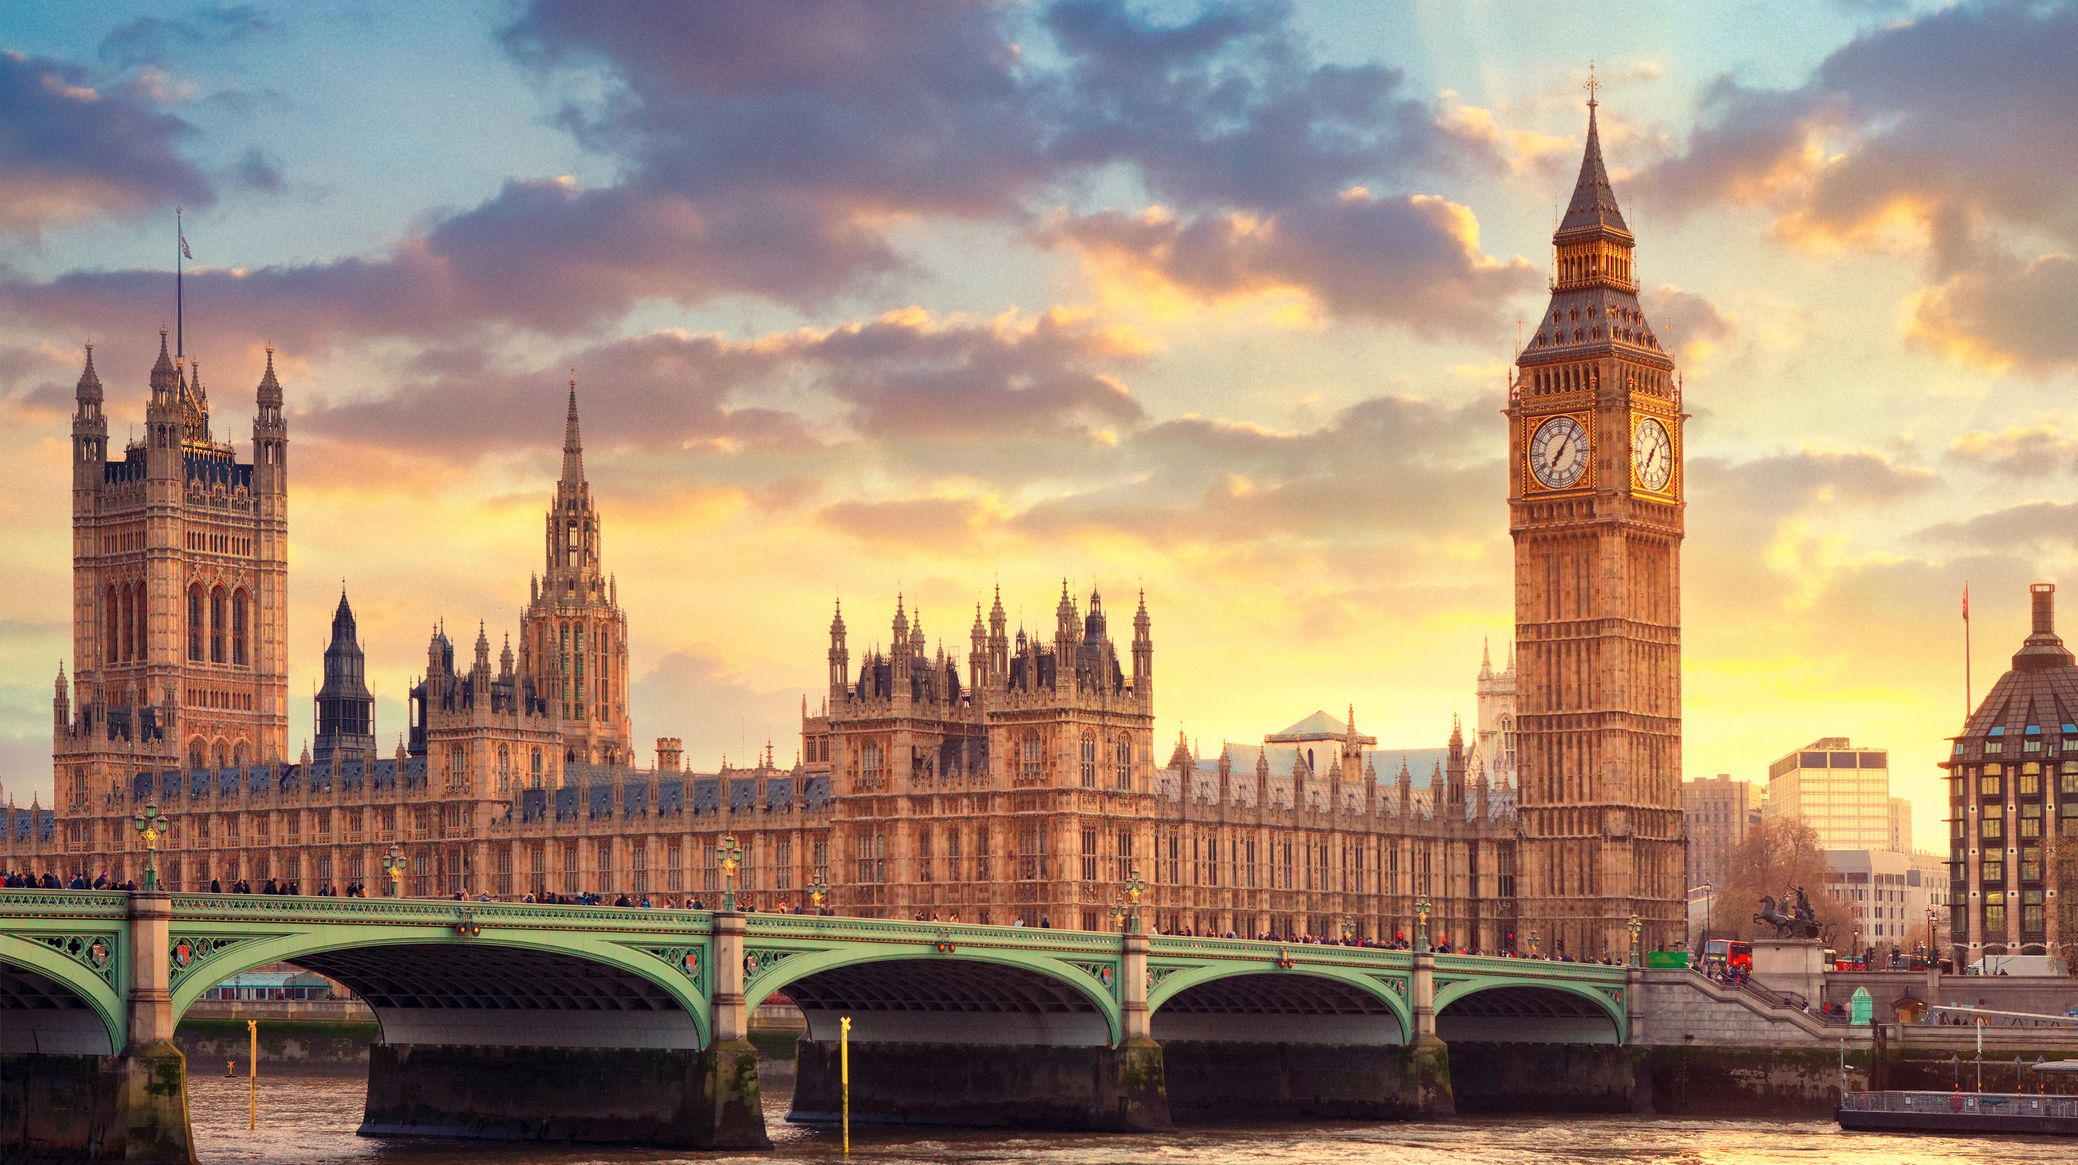 15 Huge Facts About Big Ben | Mental Floss